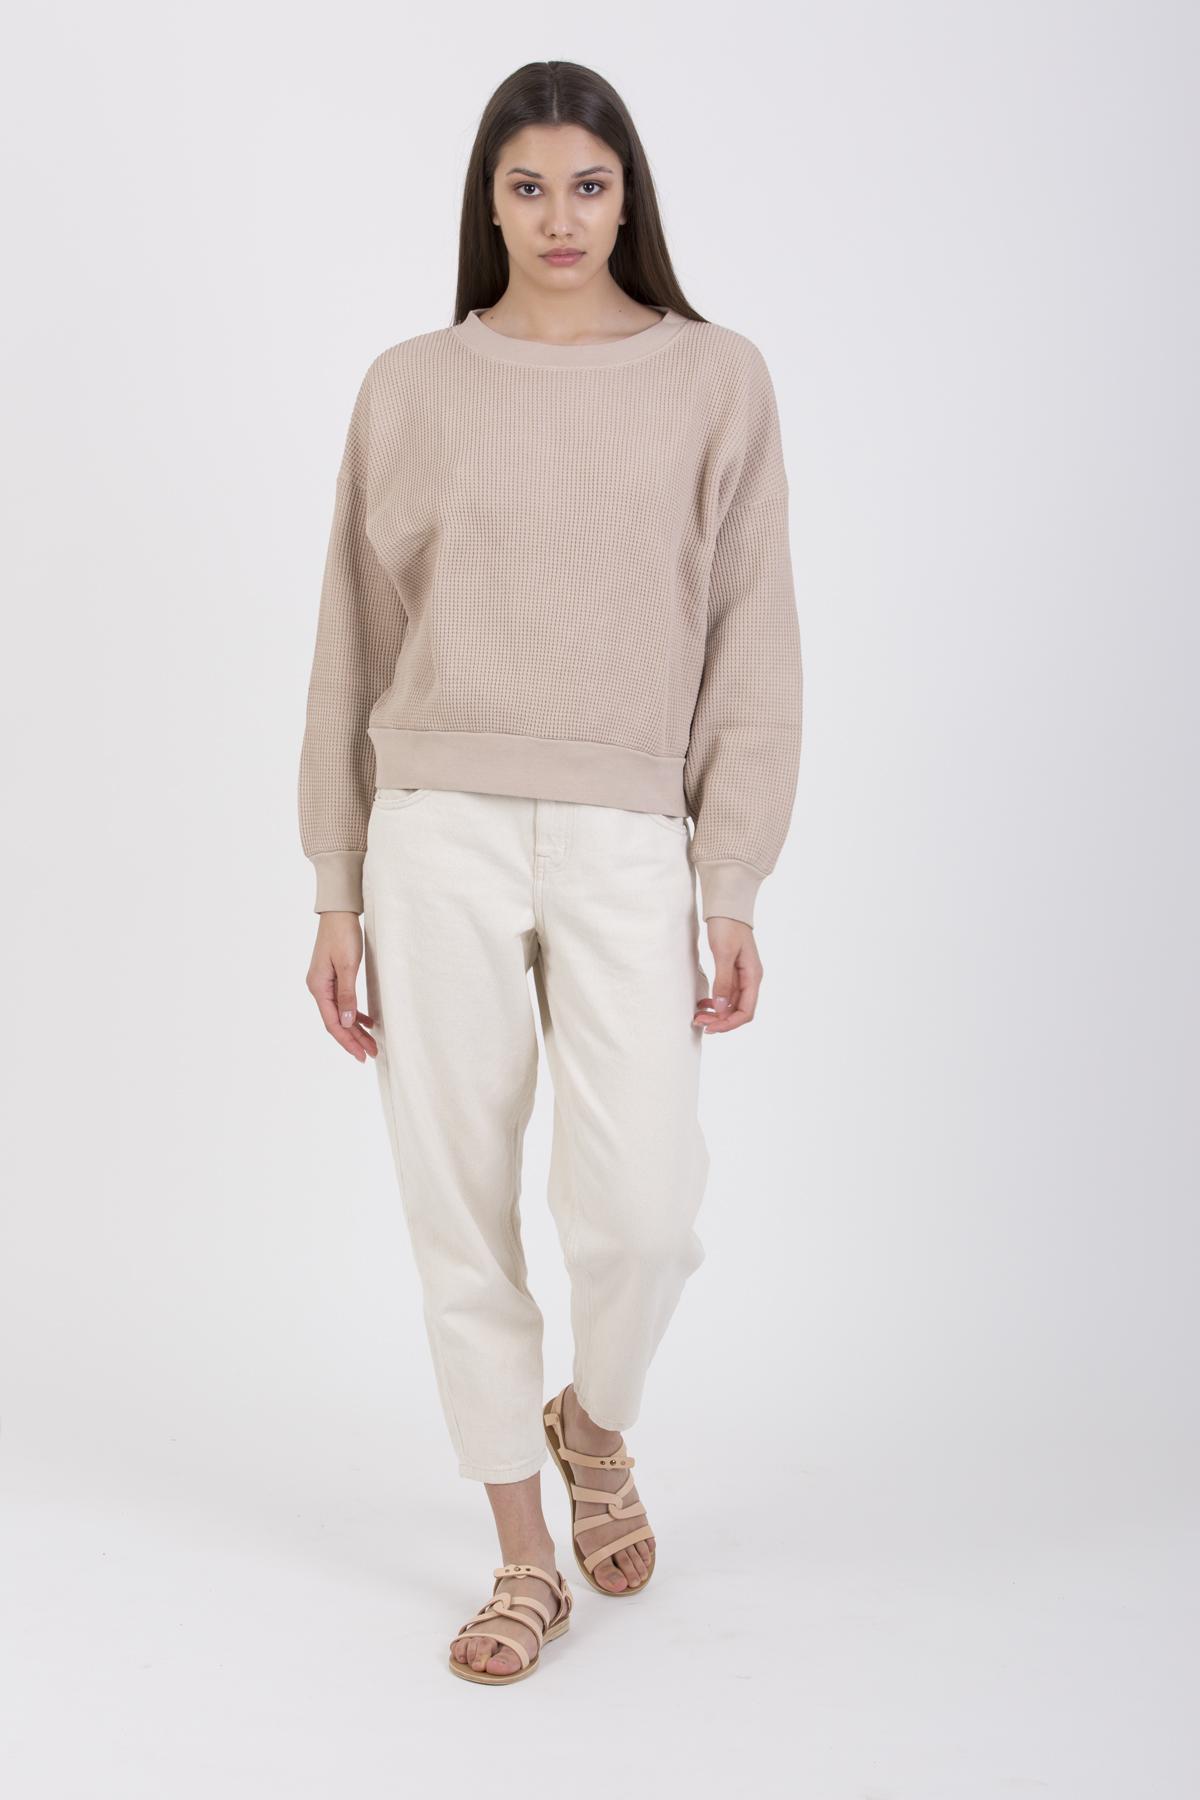 bowi-waffle-cotton-rose-sweatshirt-american-vintage-matchboxathens